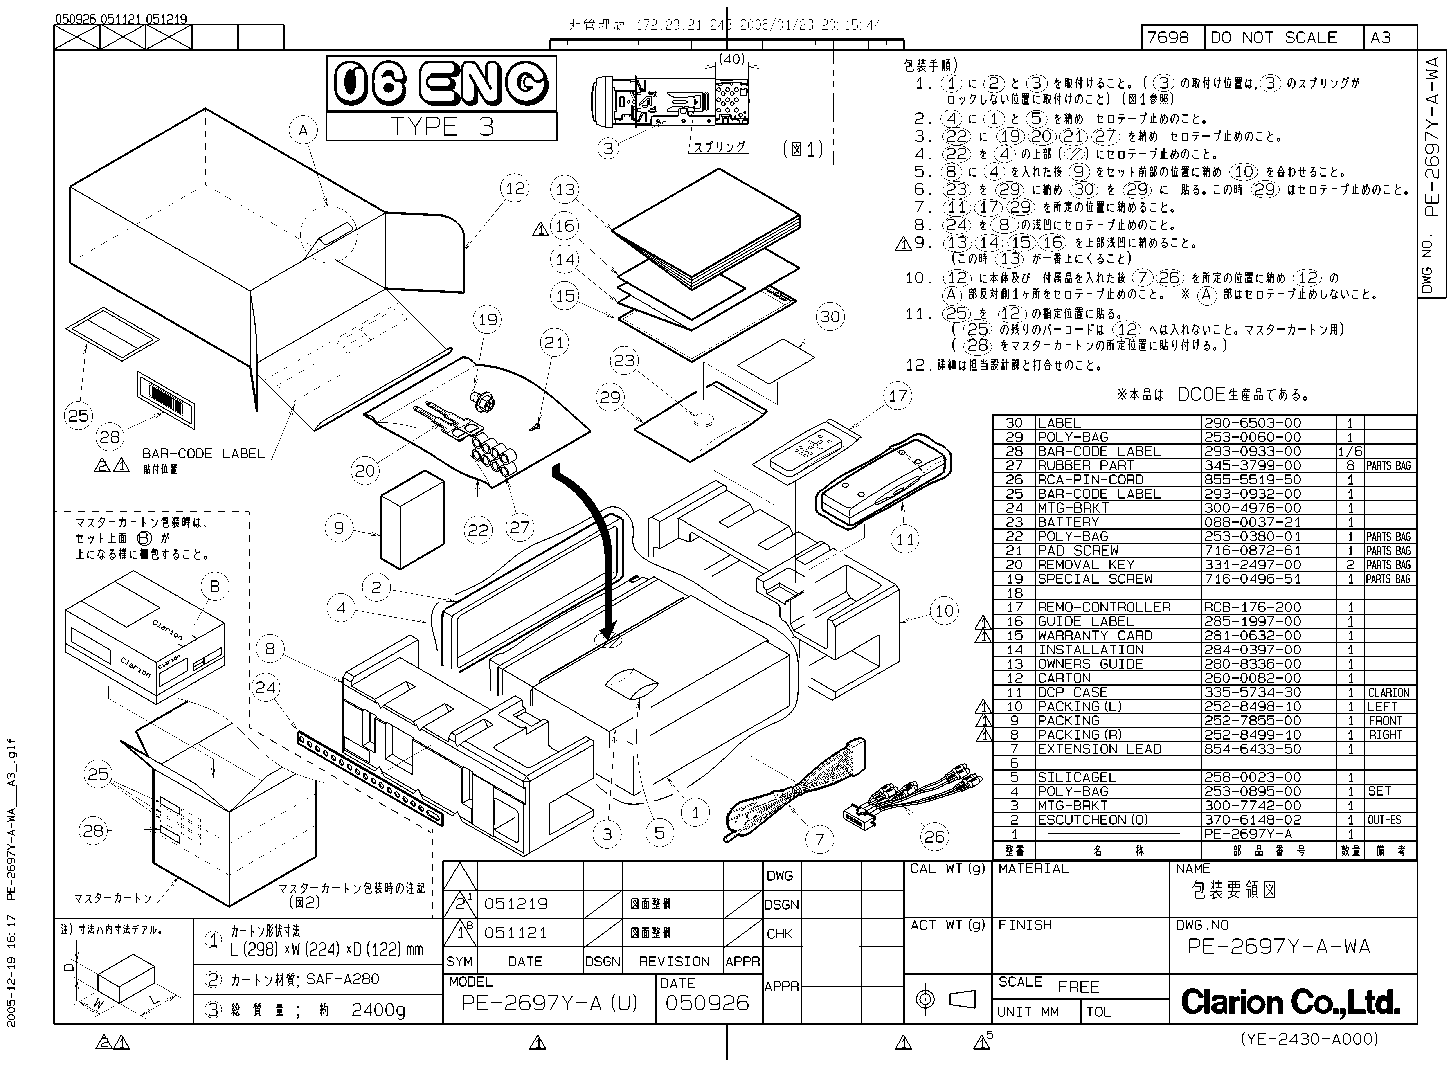 Clarion Dxz845mc 846mc Service Manual Download Schematics Eeprom Wiring Diagram Free Schematic Pe2697ya Wa